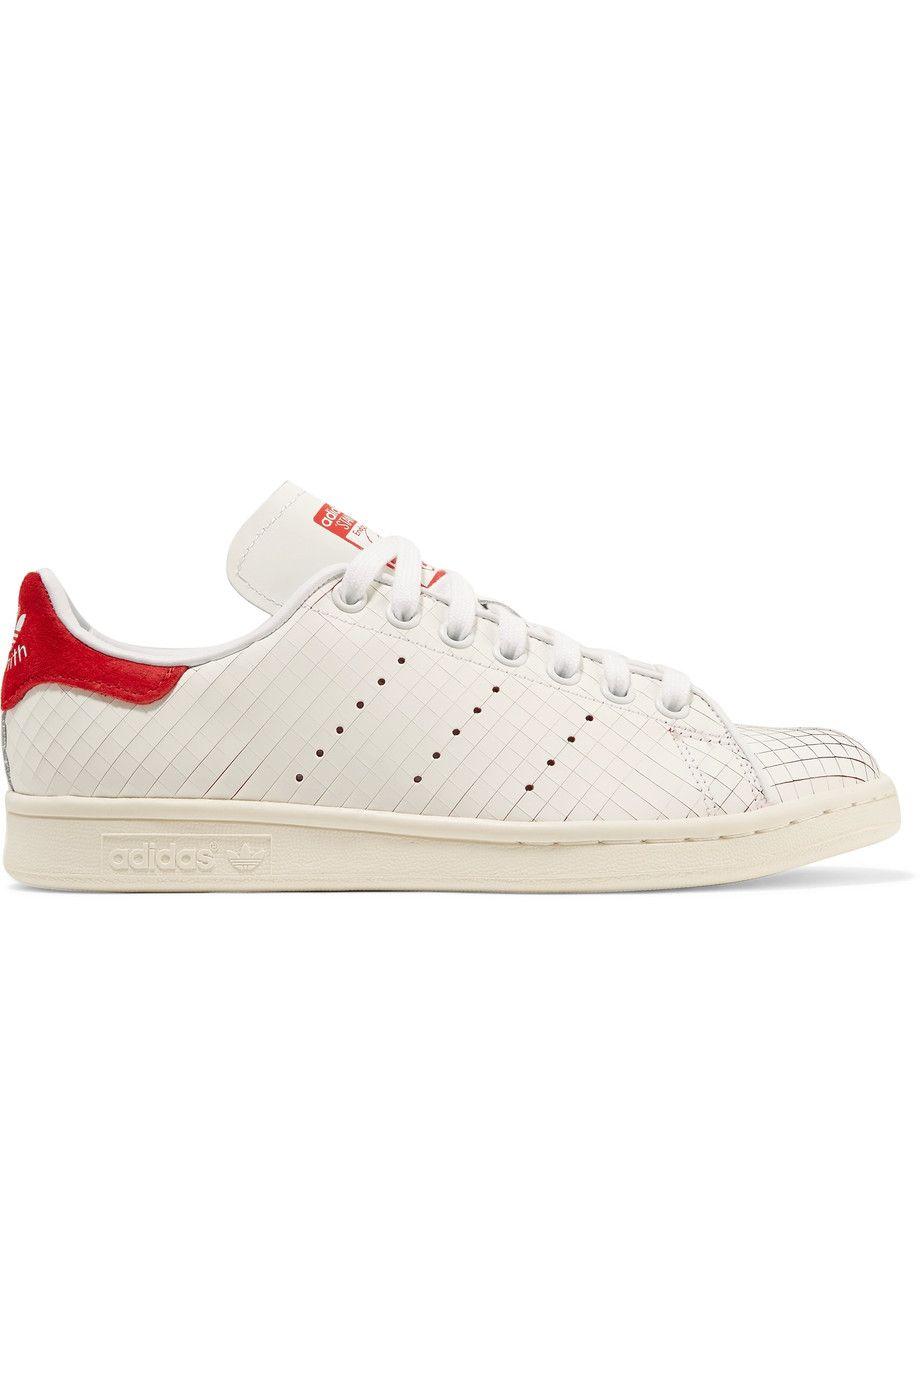 9439ceec8f9038 ADIDAS ORIGINALS Stan Smith Suede-Trimmed Laser-Cut Leather Sneakers.   adidasoriginals  shoes  sneakers